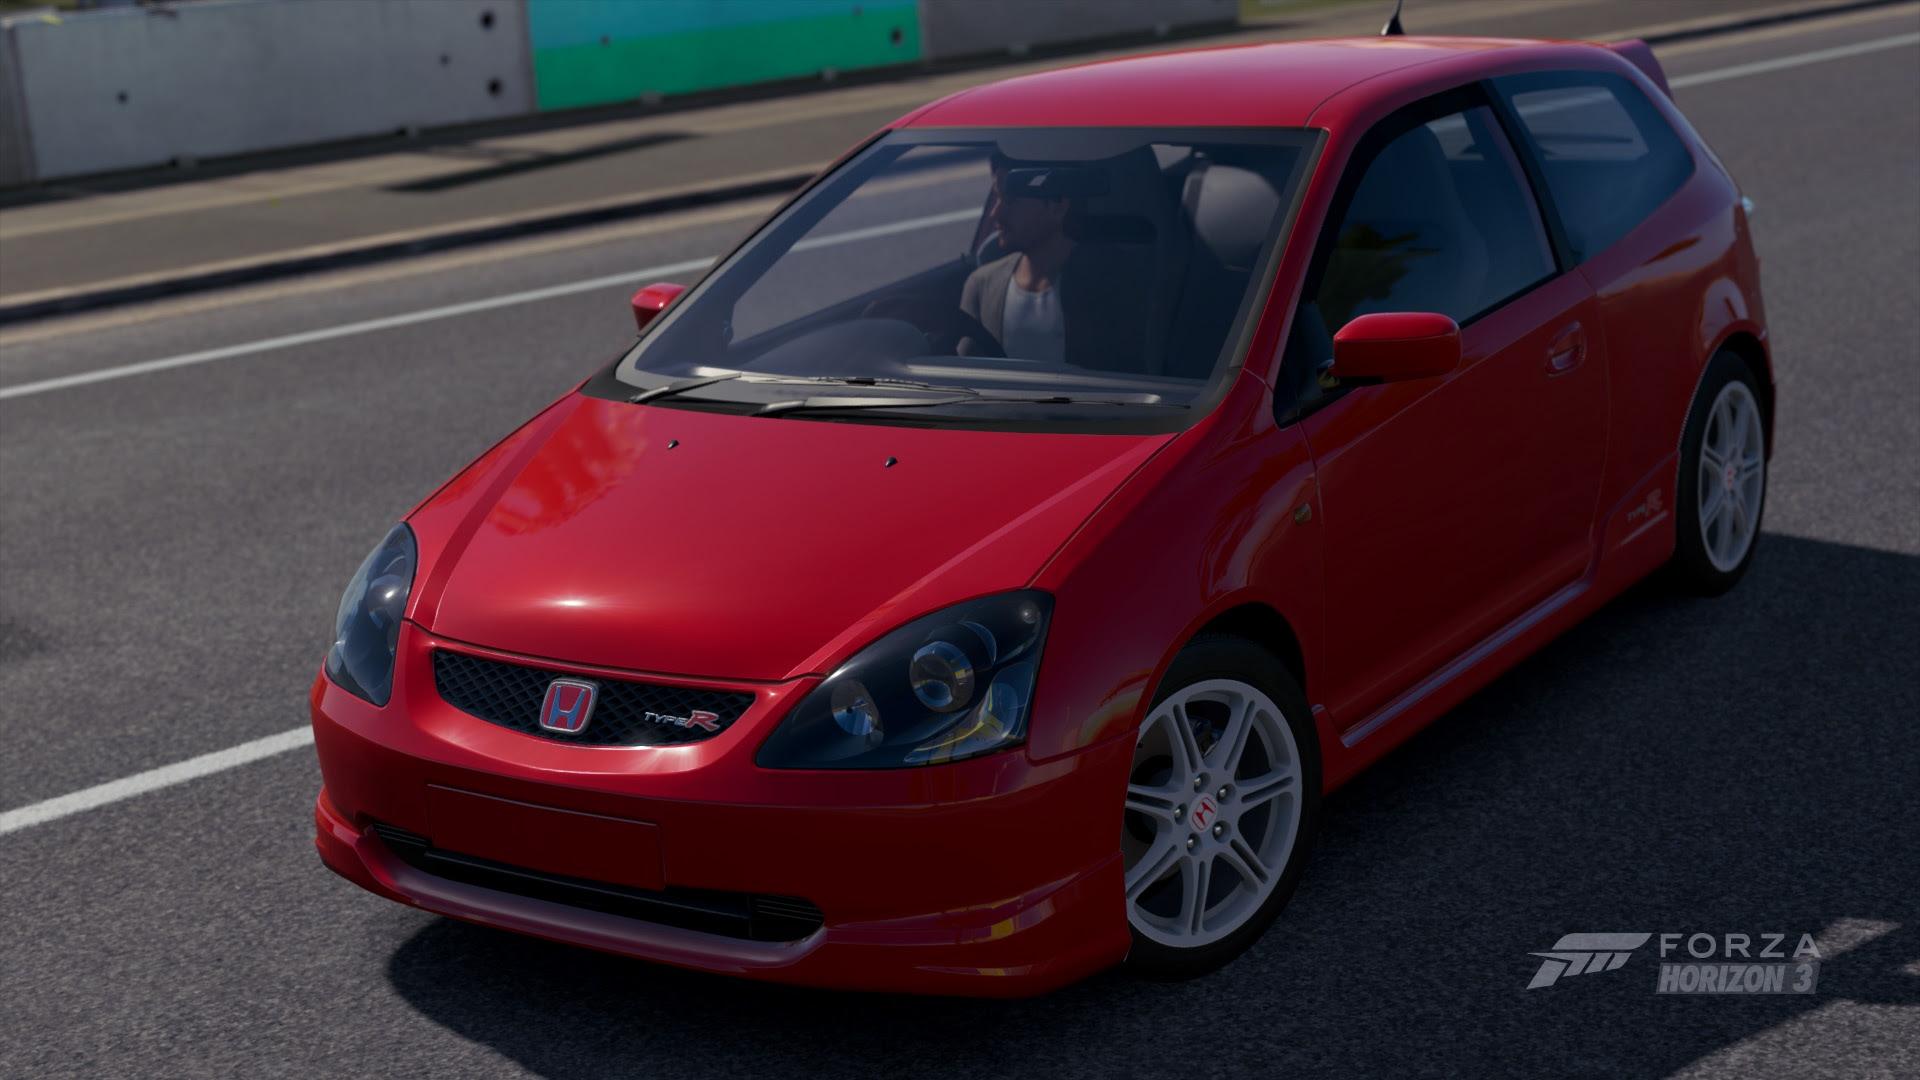 Honda Civic 2004 Modified